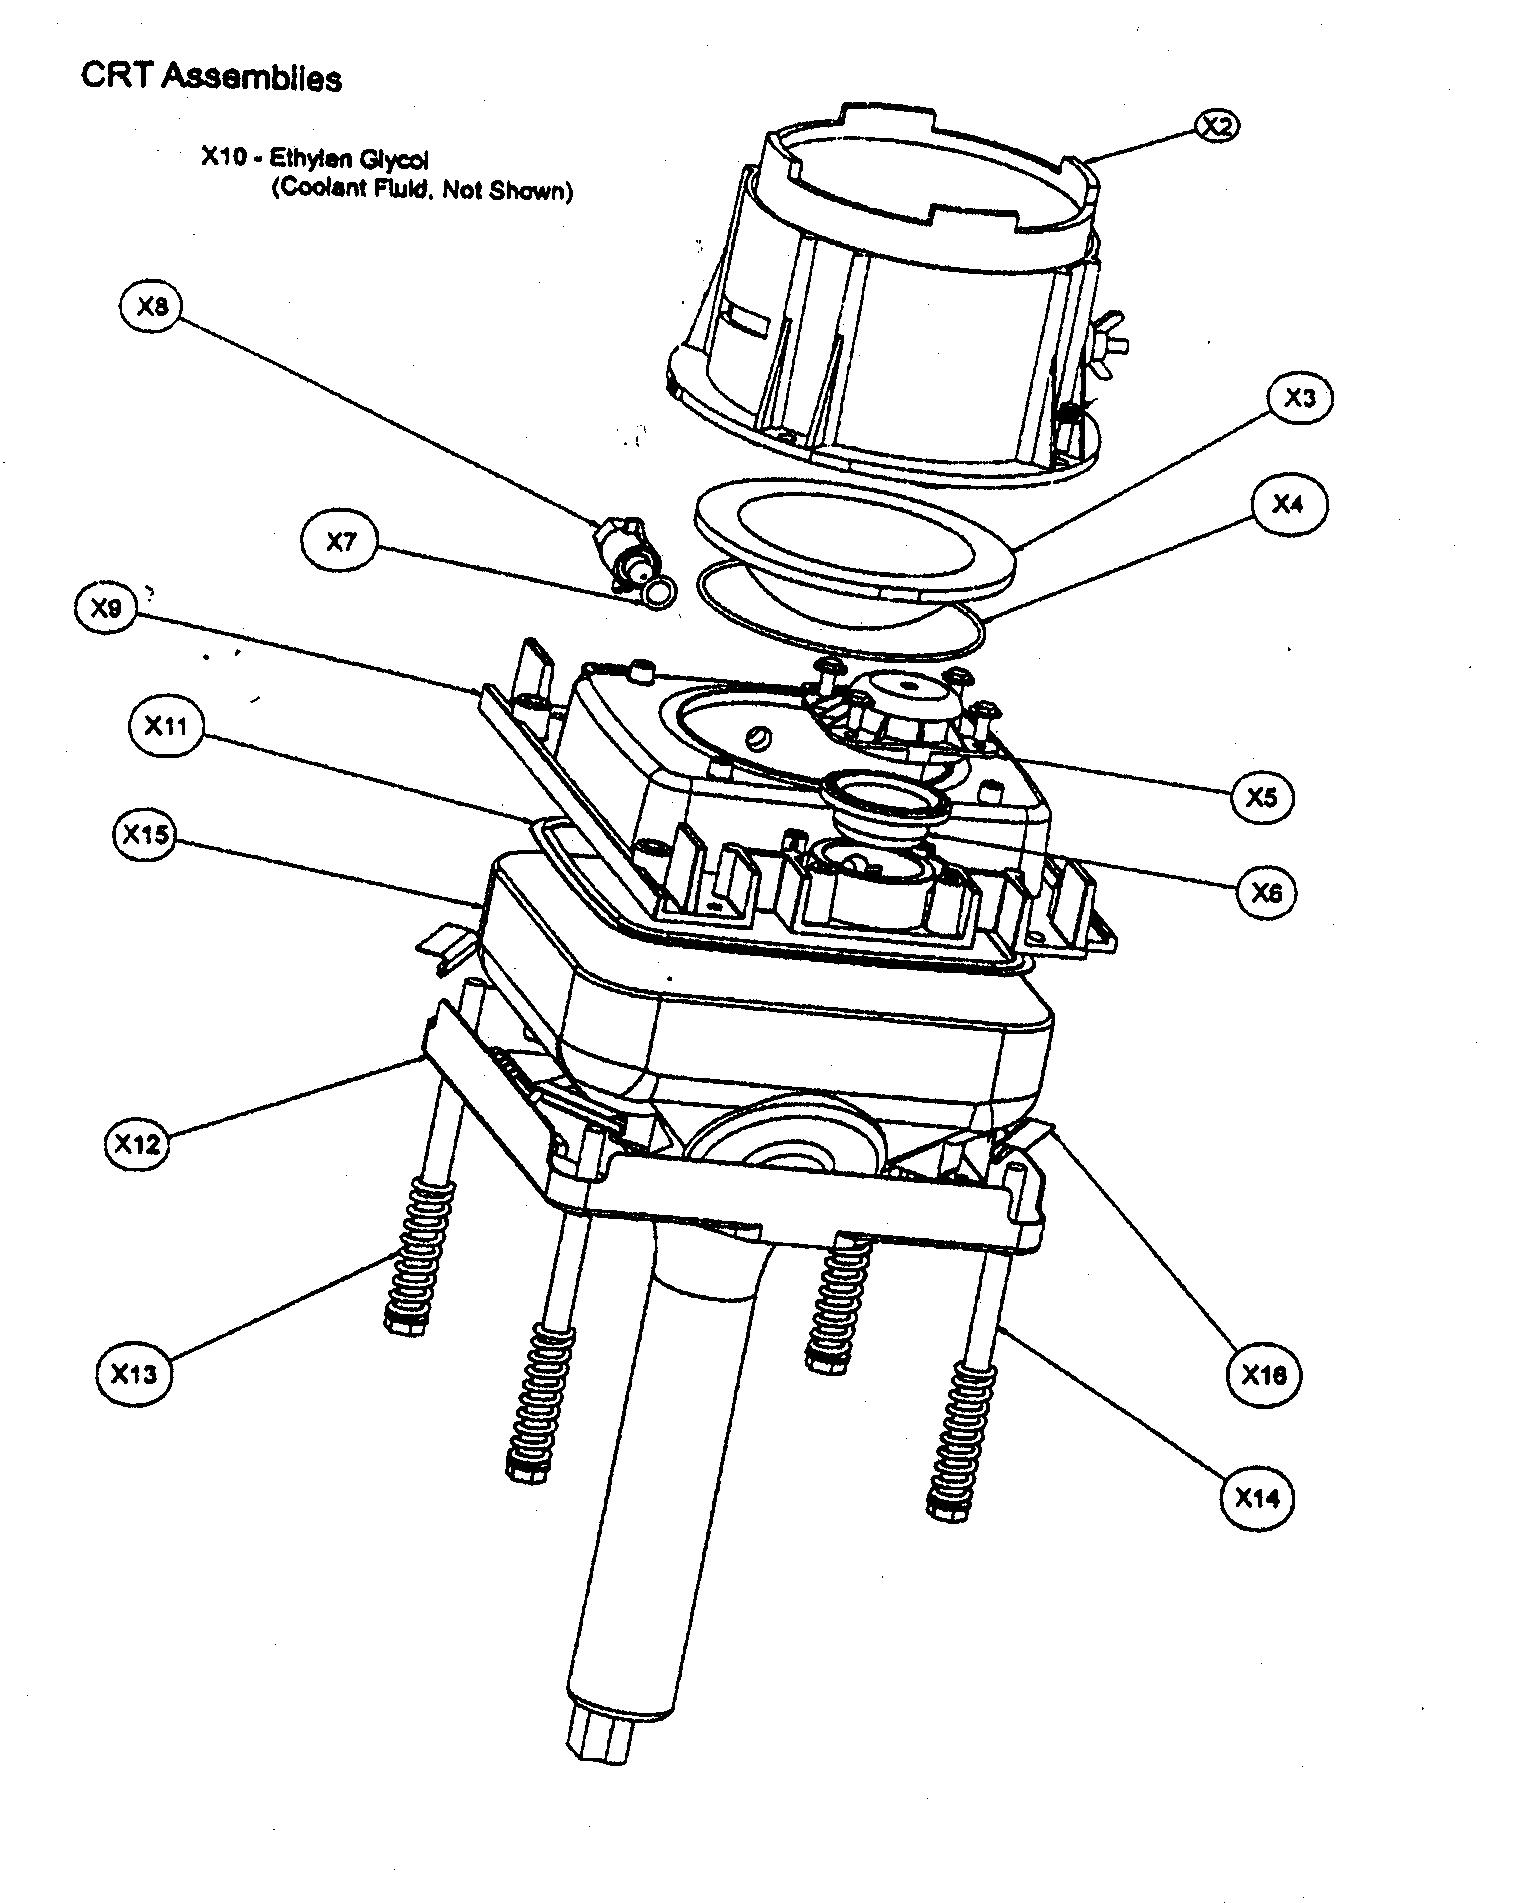 CRT ASSY Diagram & Parts List for Model 60pw9383 Magnavox